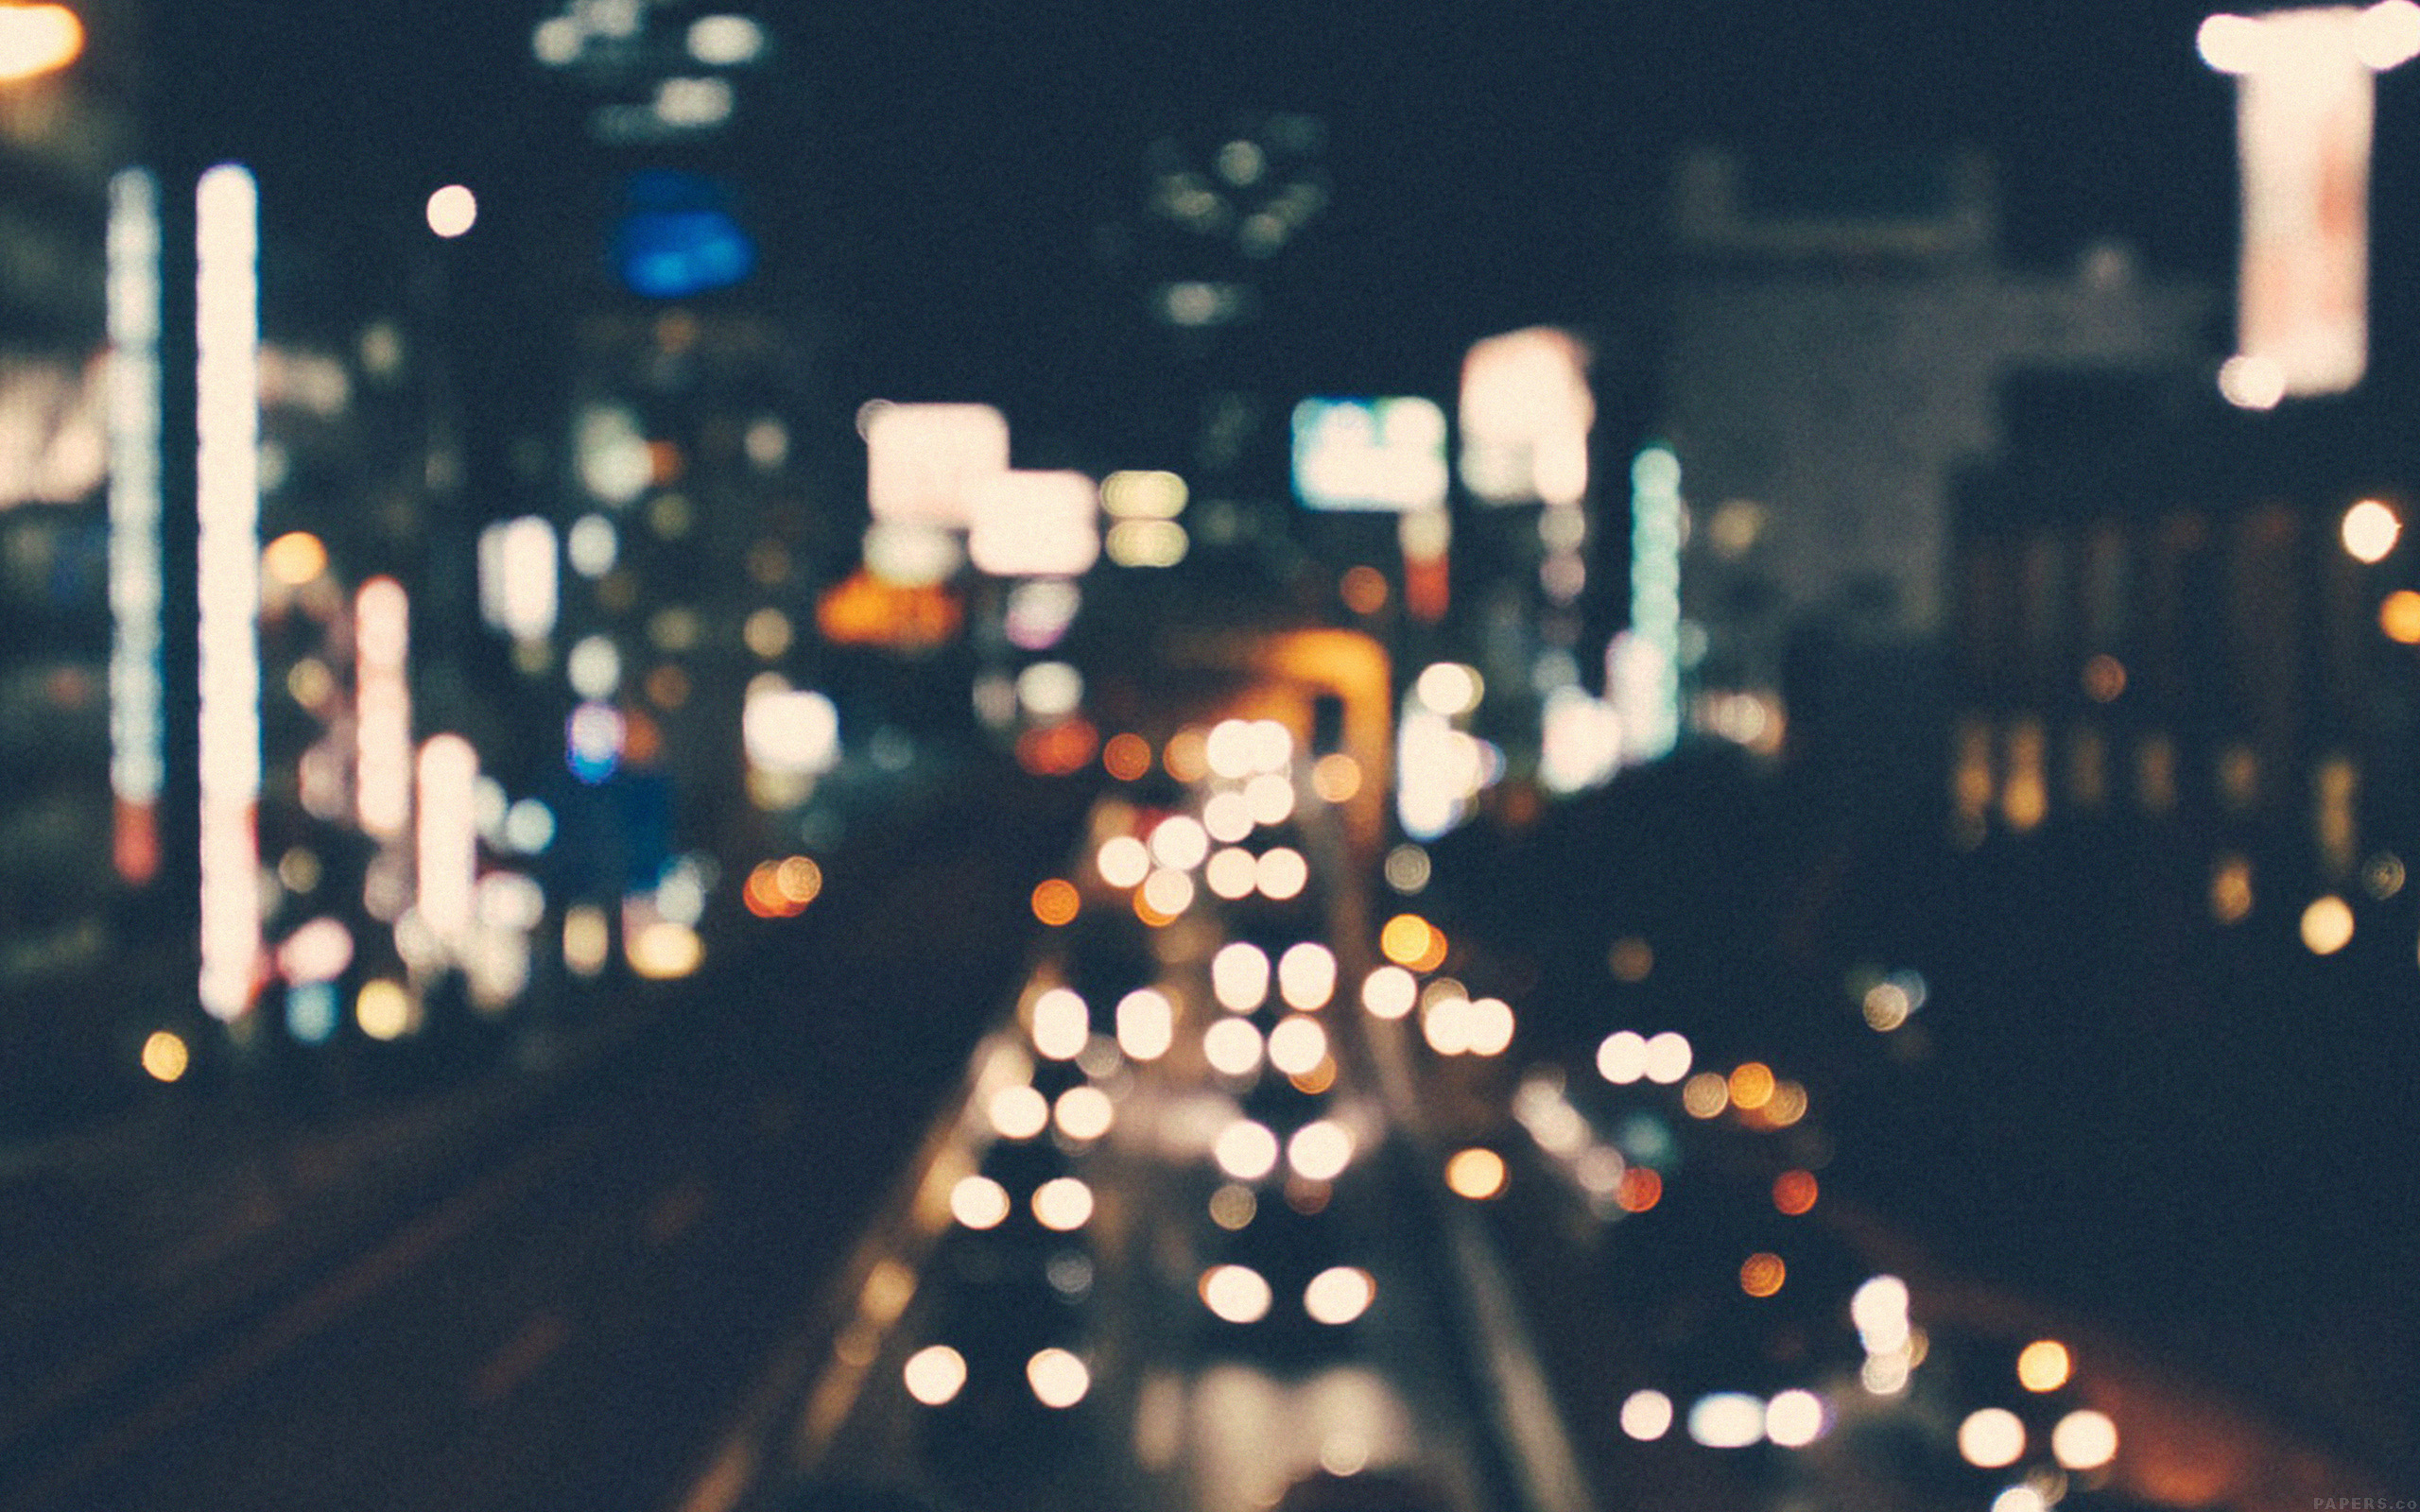 mn03-city-bokeh-night-street-nature-wallpaper